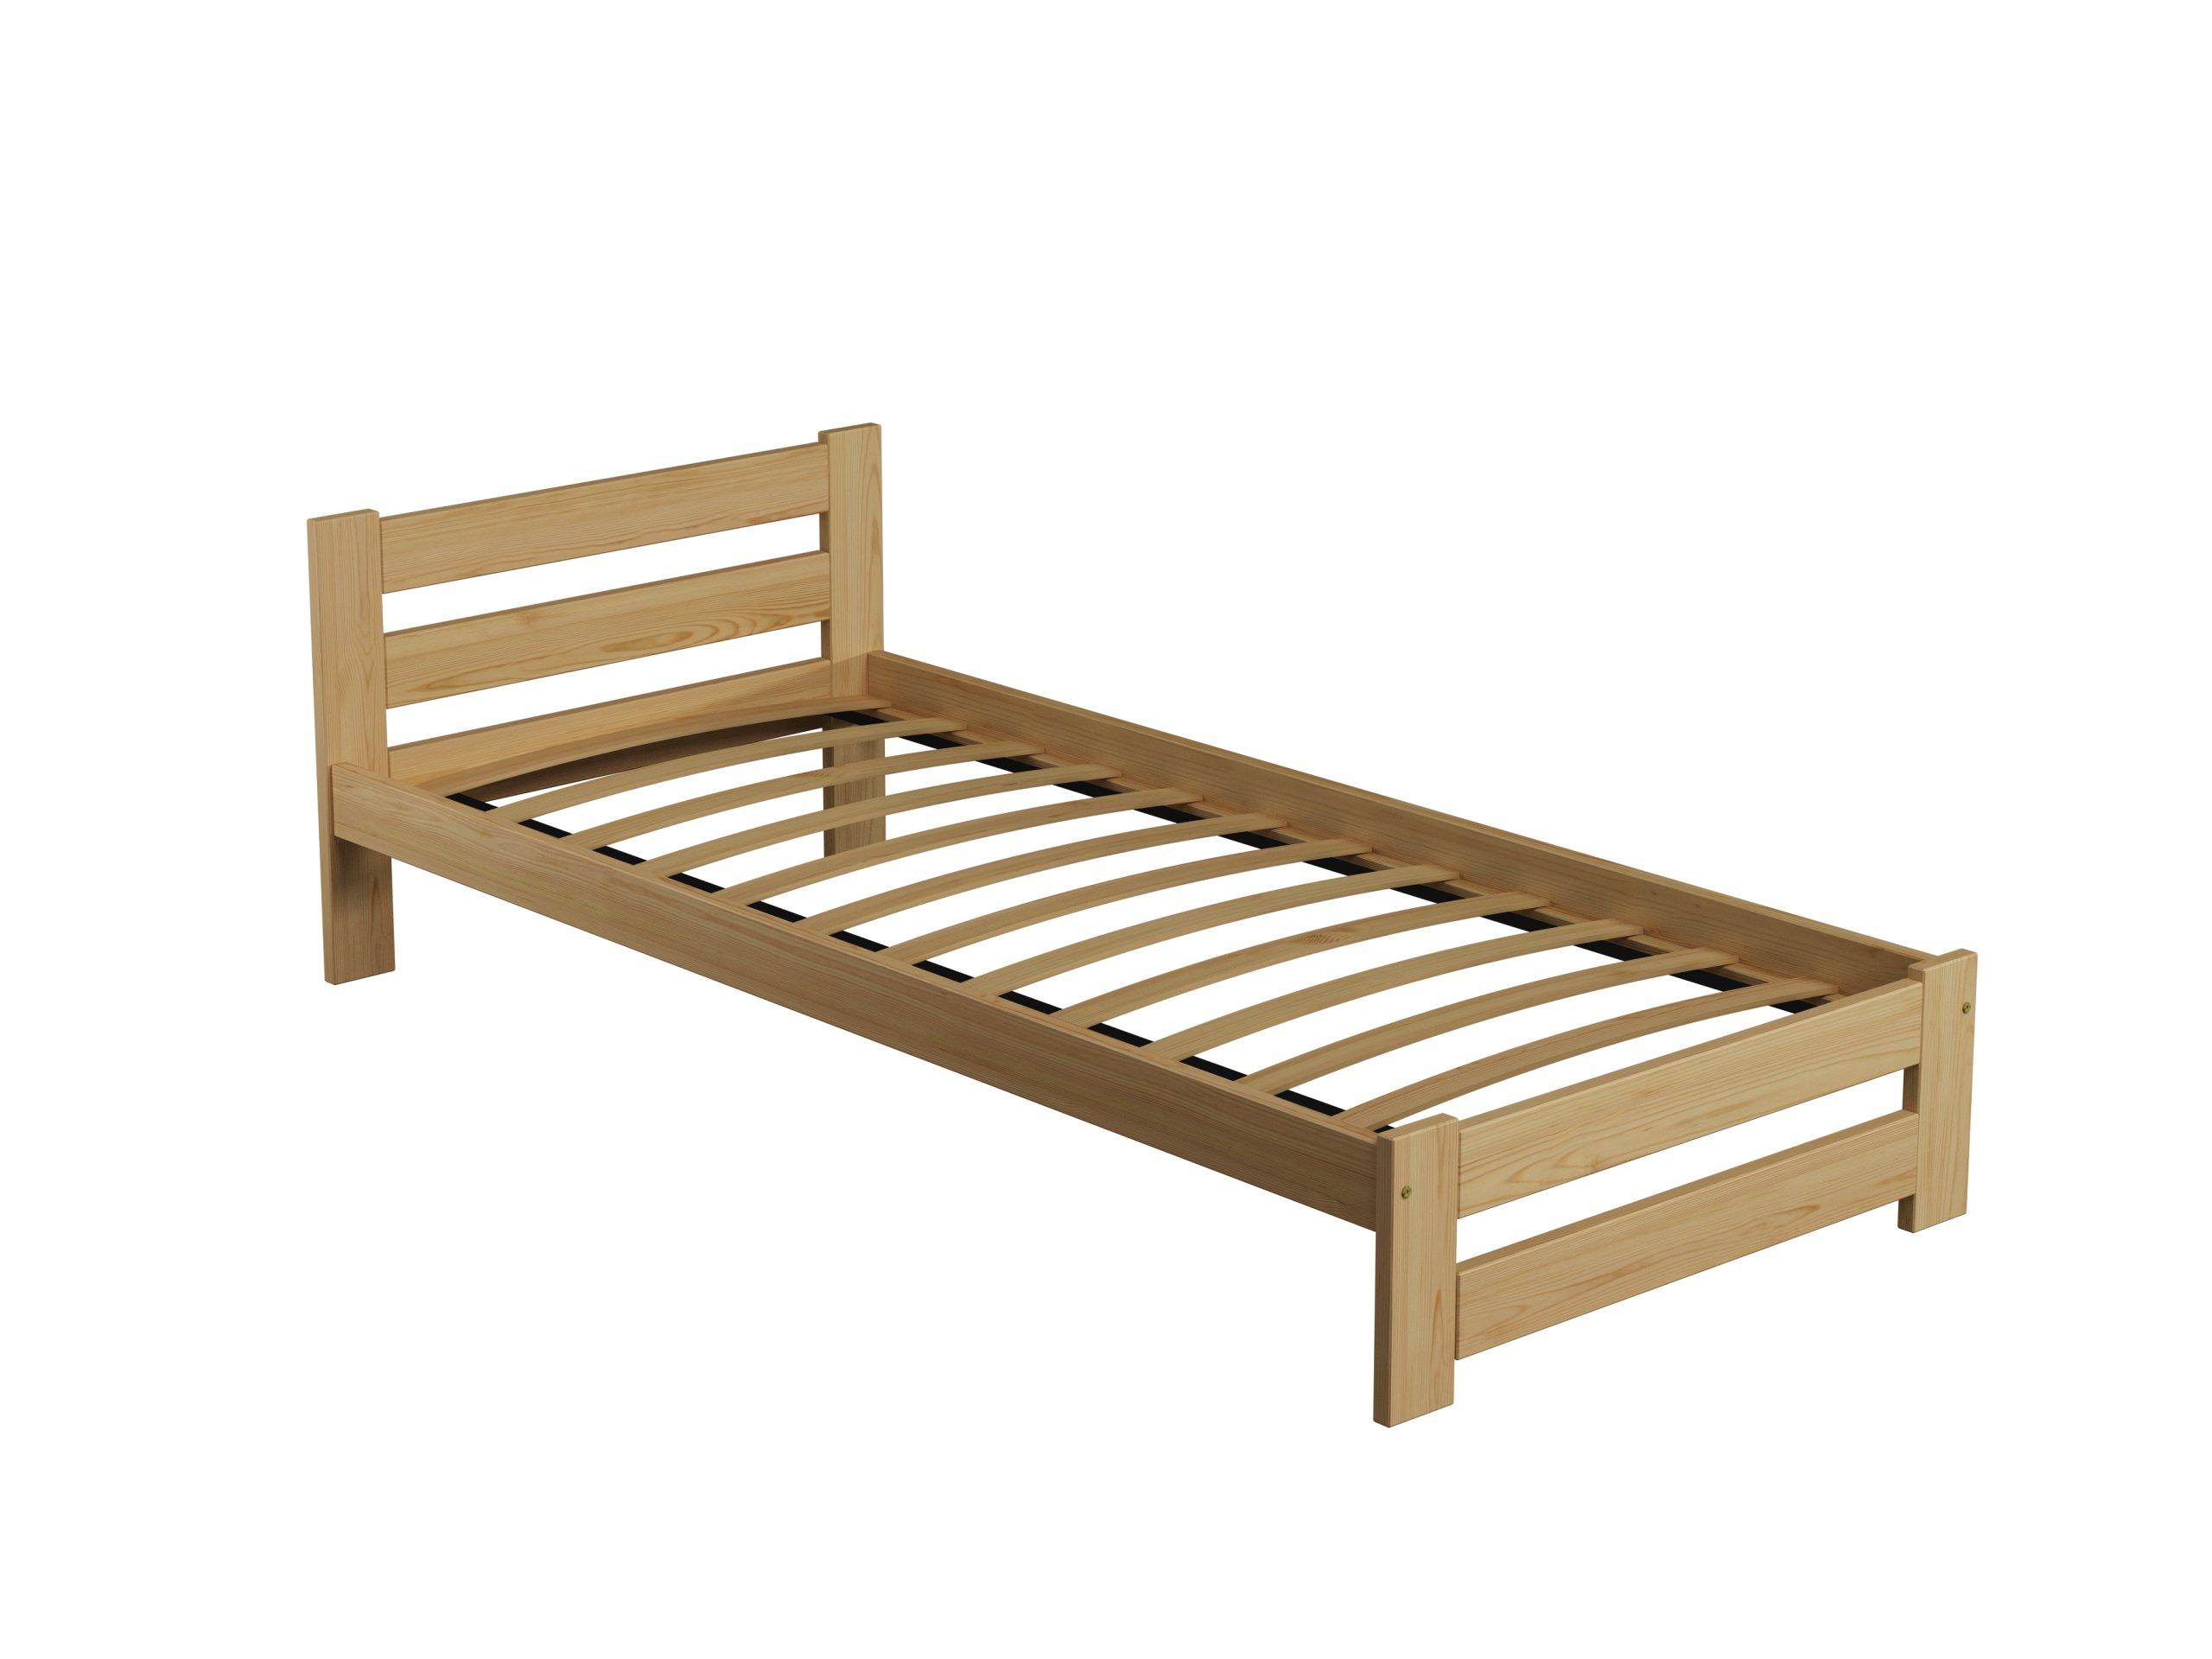 Stelaż Pod Materac Do łóżka Wkład 90x200 Magnat 6582301564